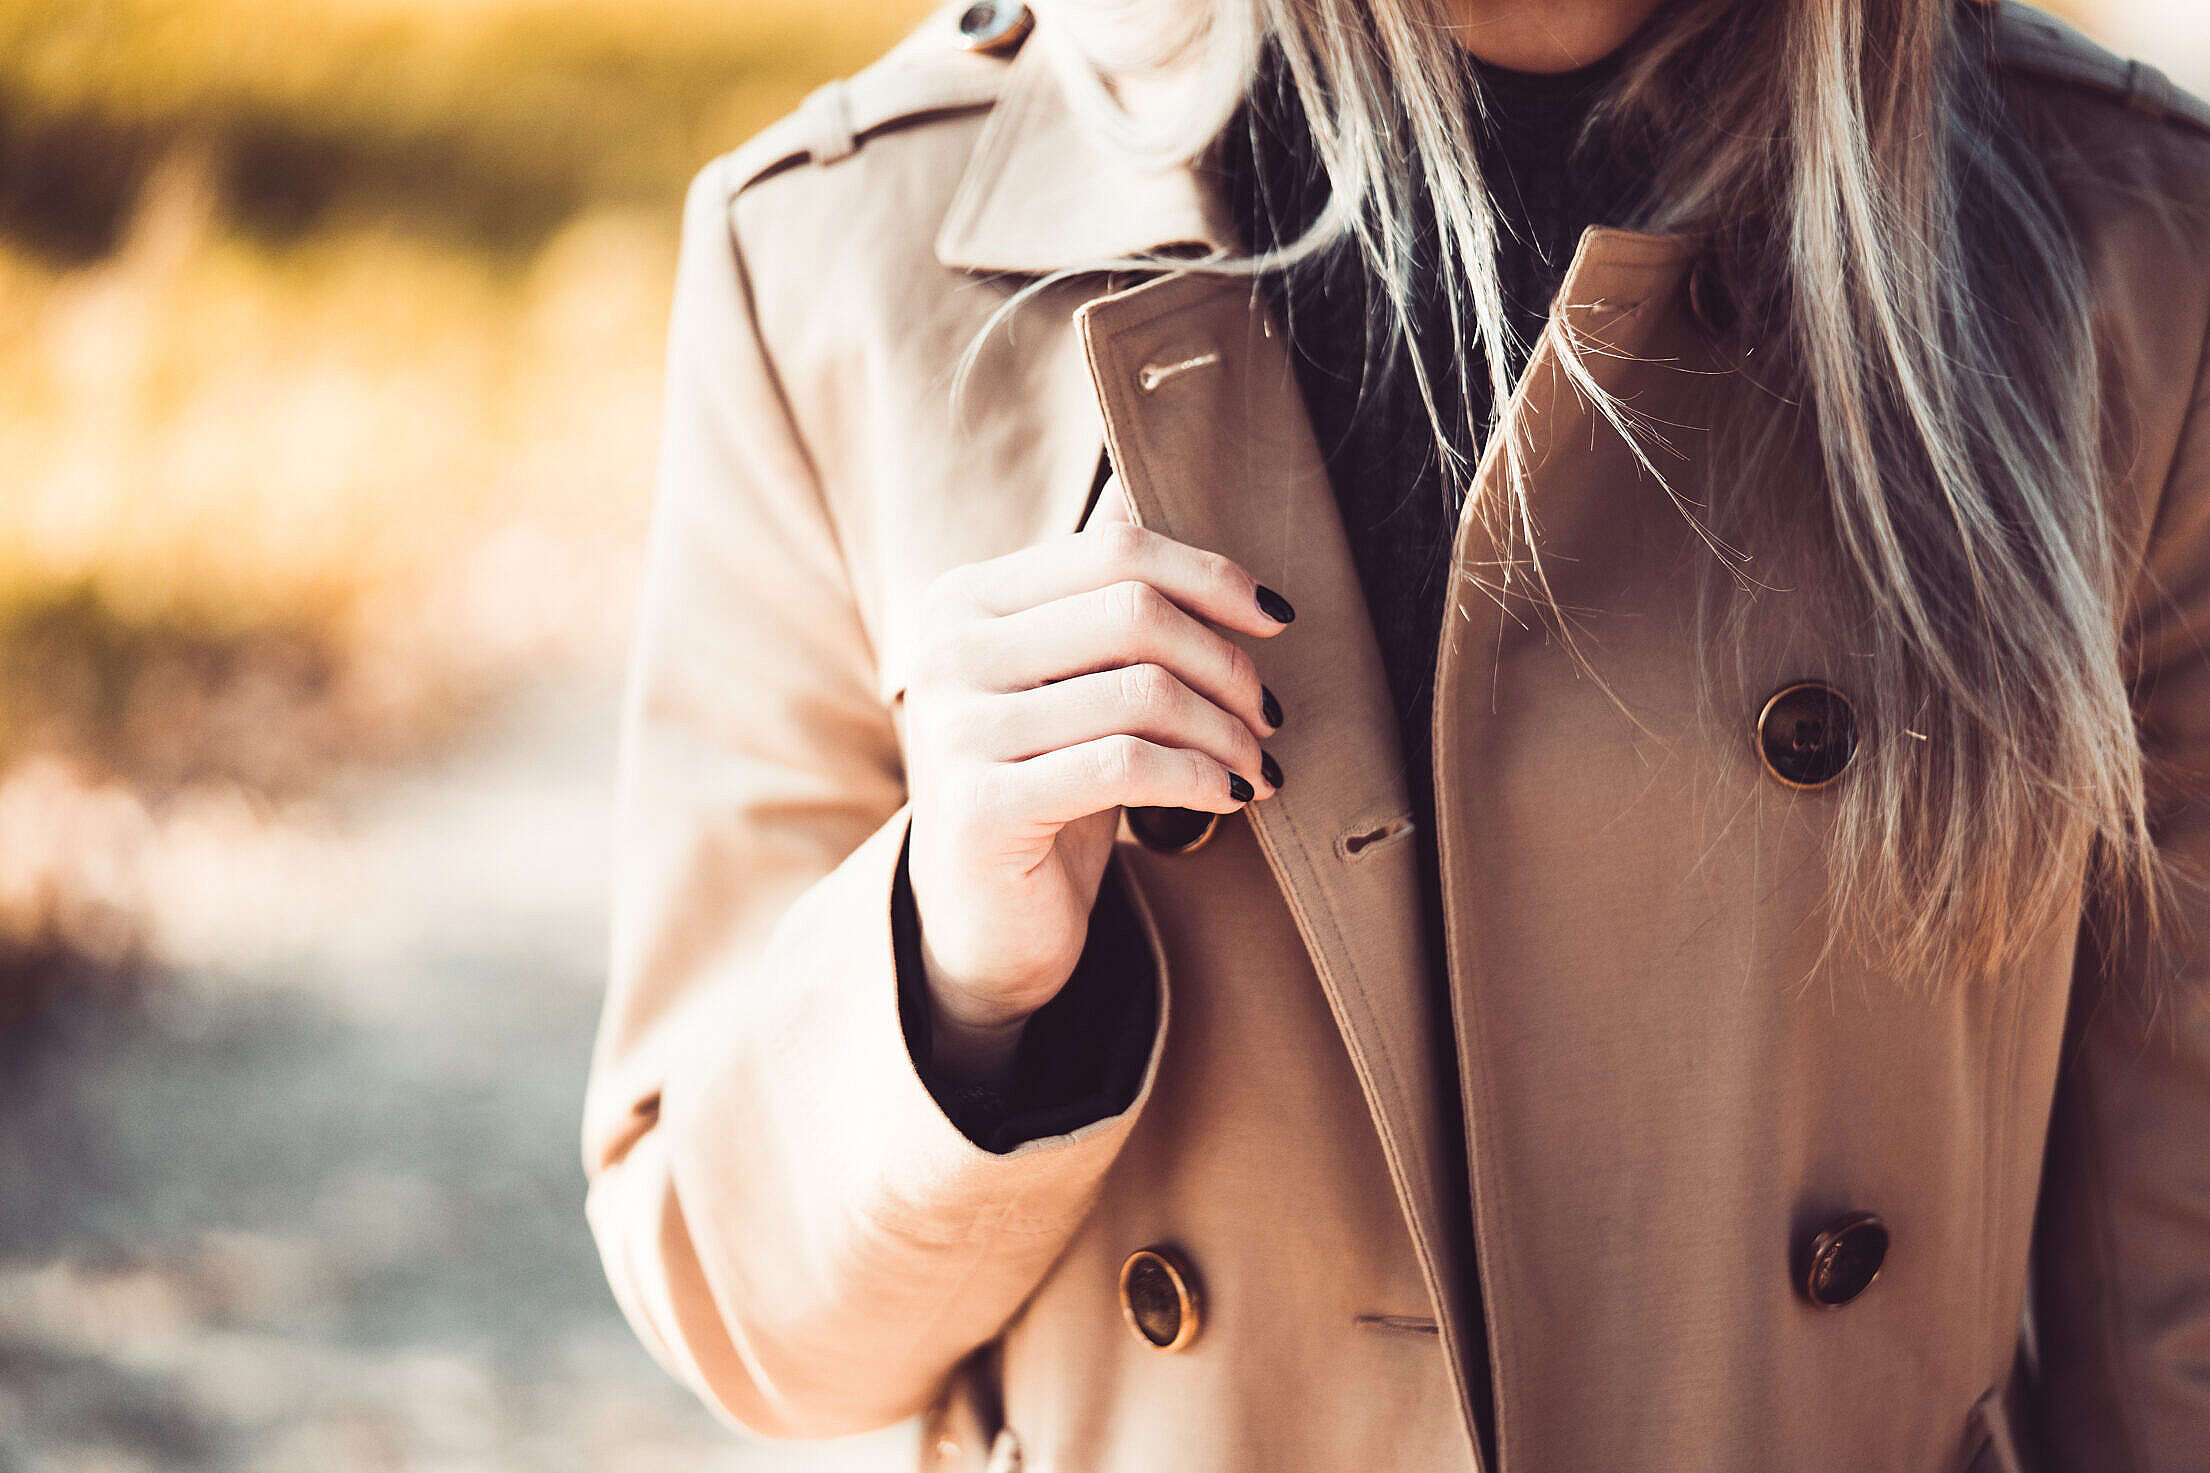 Woman Wearing an Elegant Brown Coat Free Stock Photo